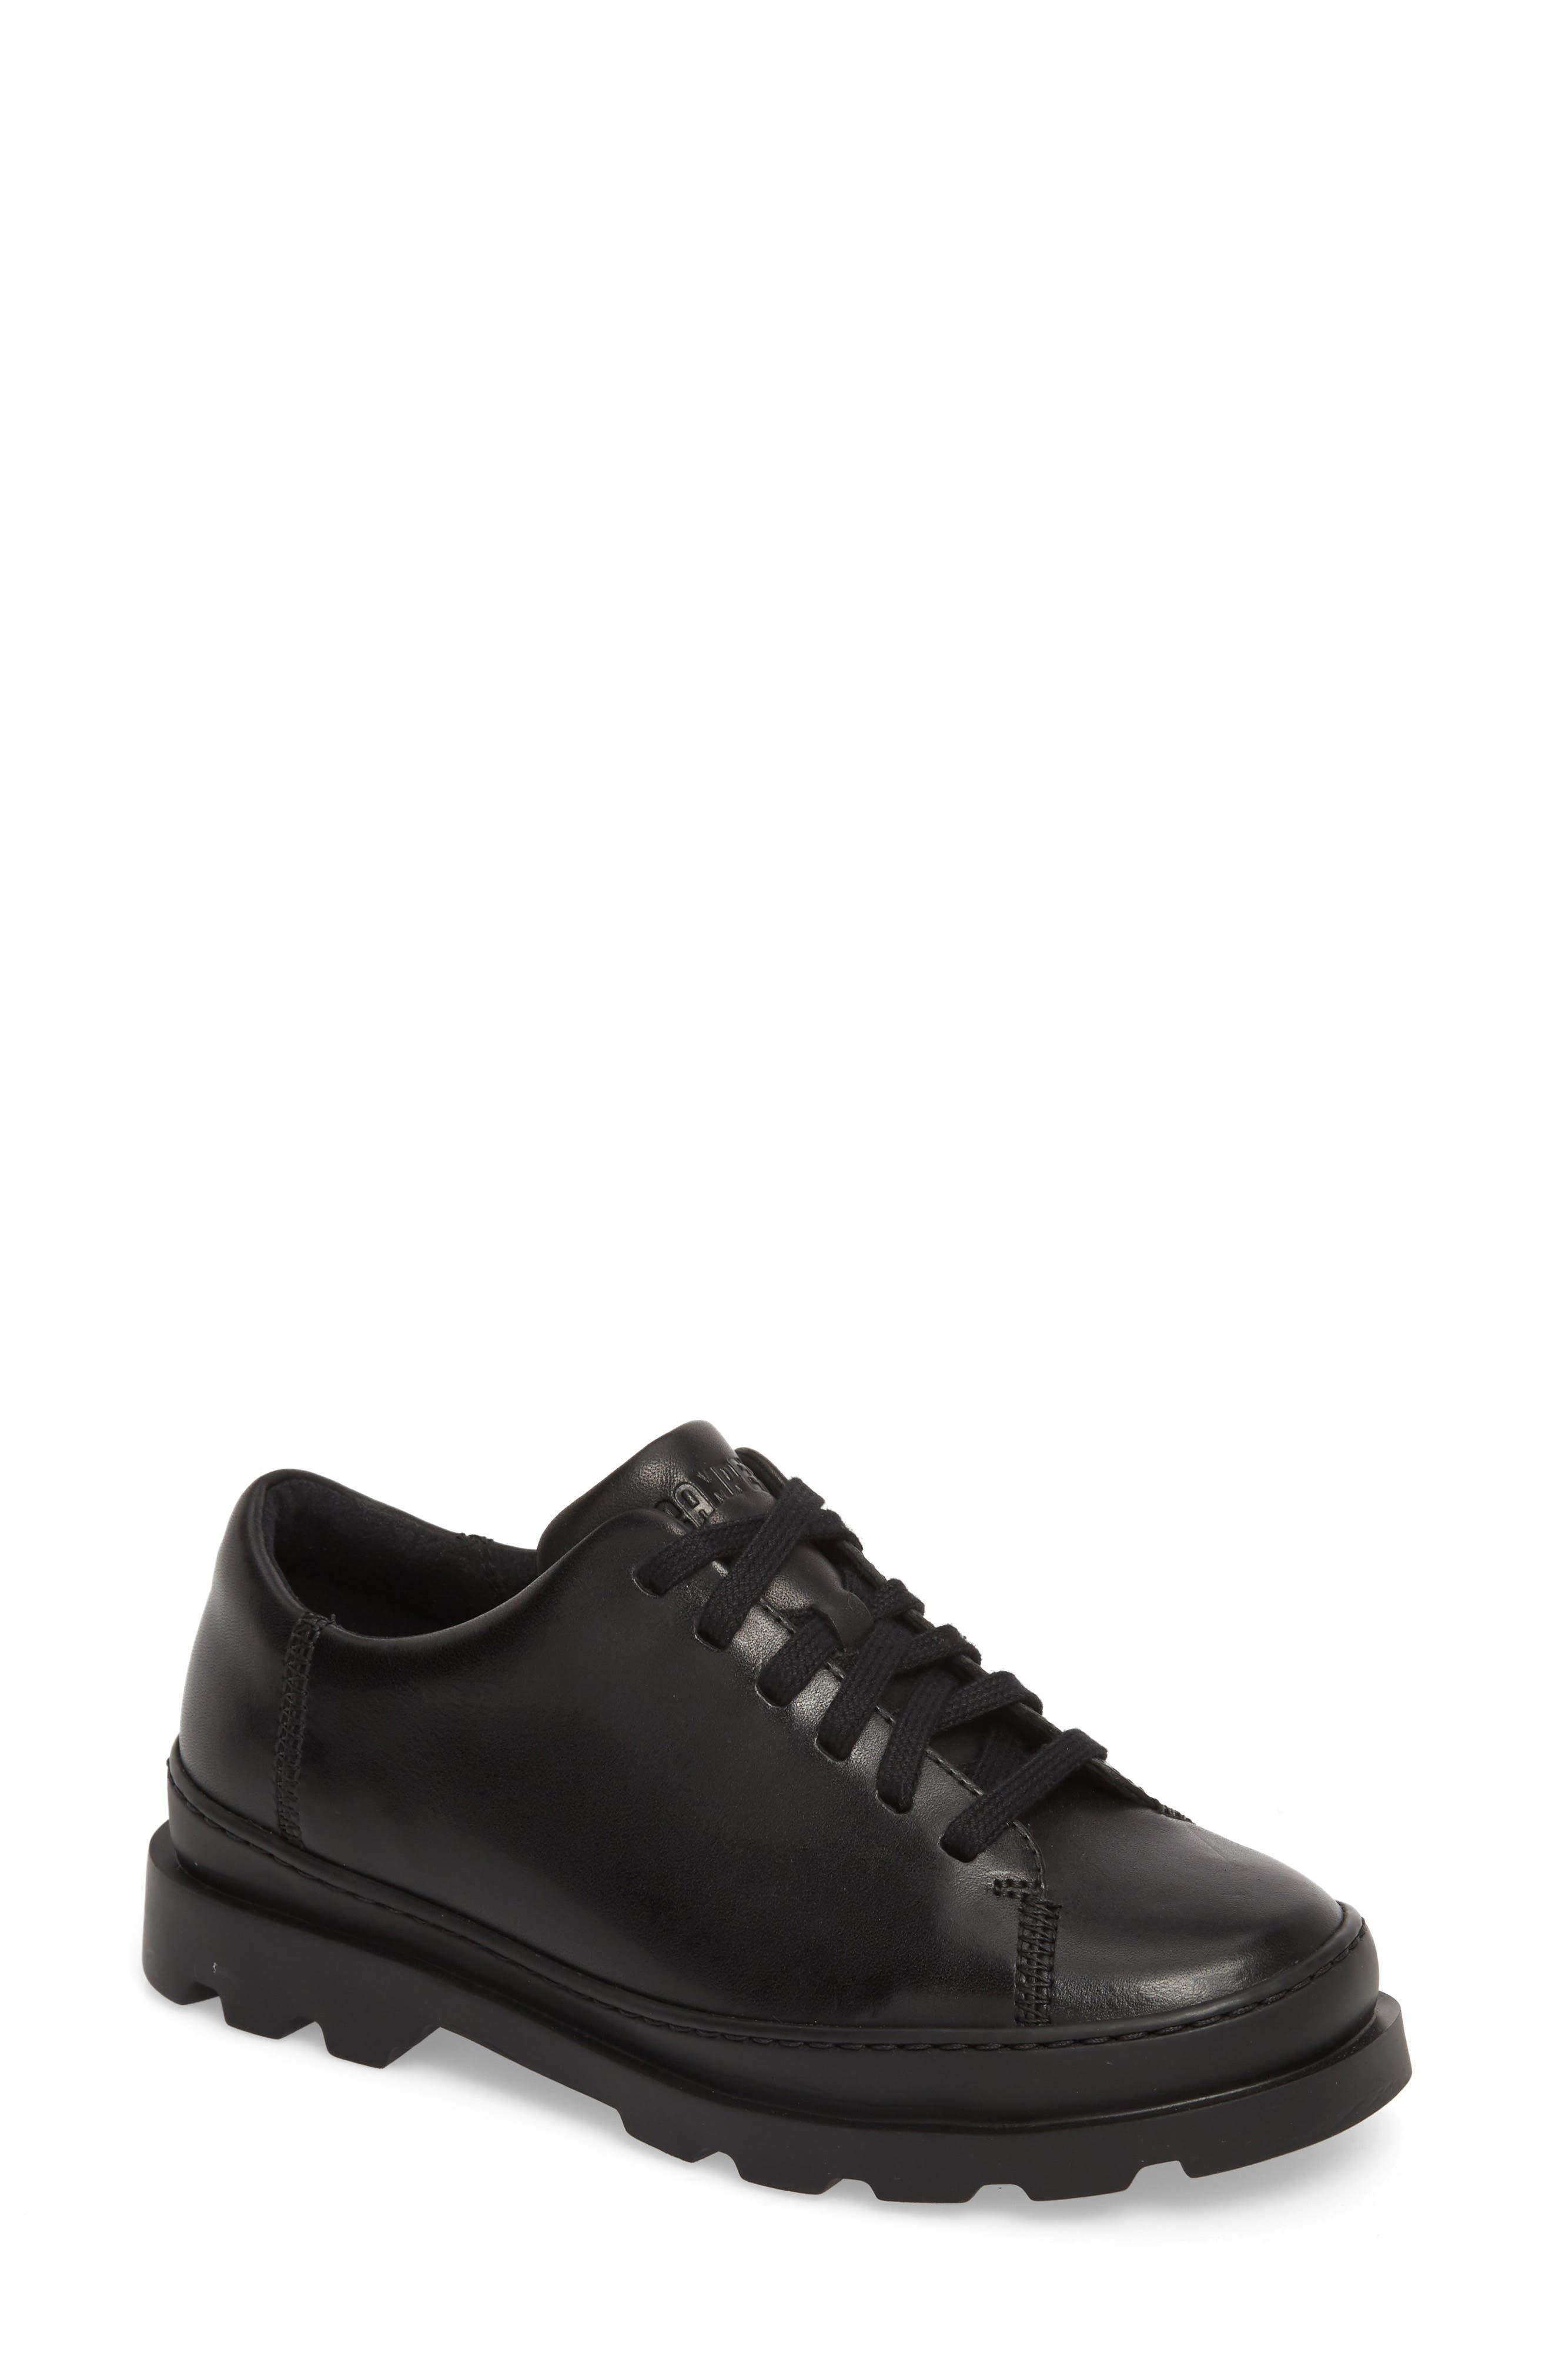 Brutus Sneaker,                             Main thumbnail 1, color,                             BLACK LEATHER